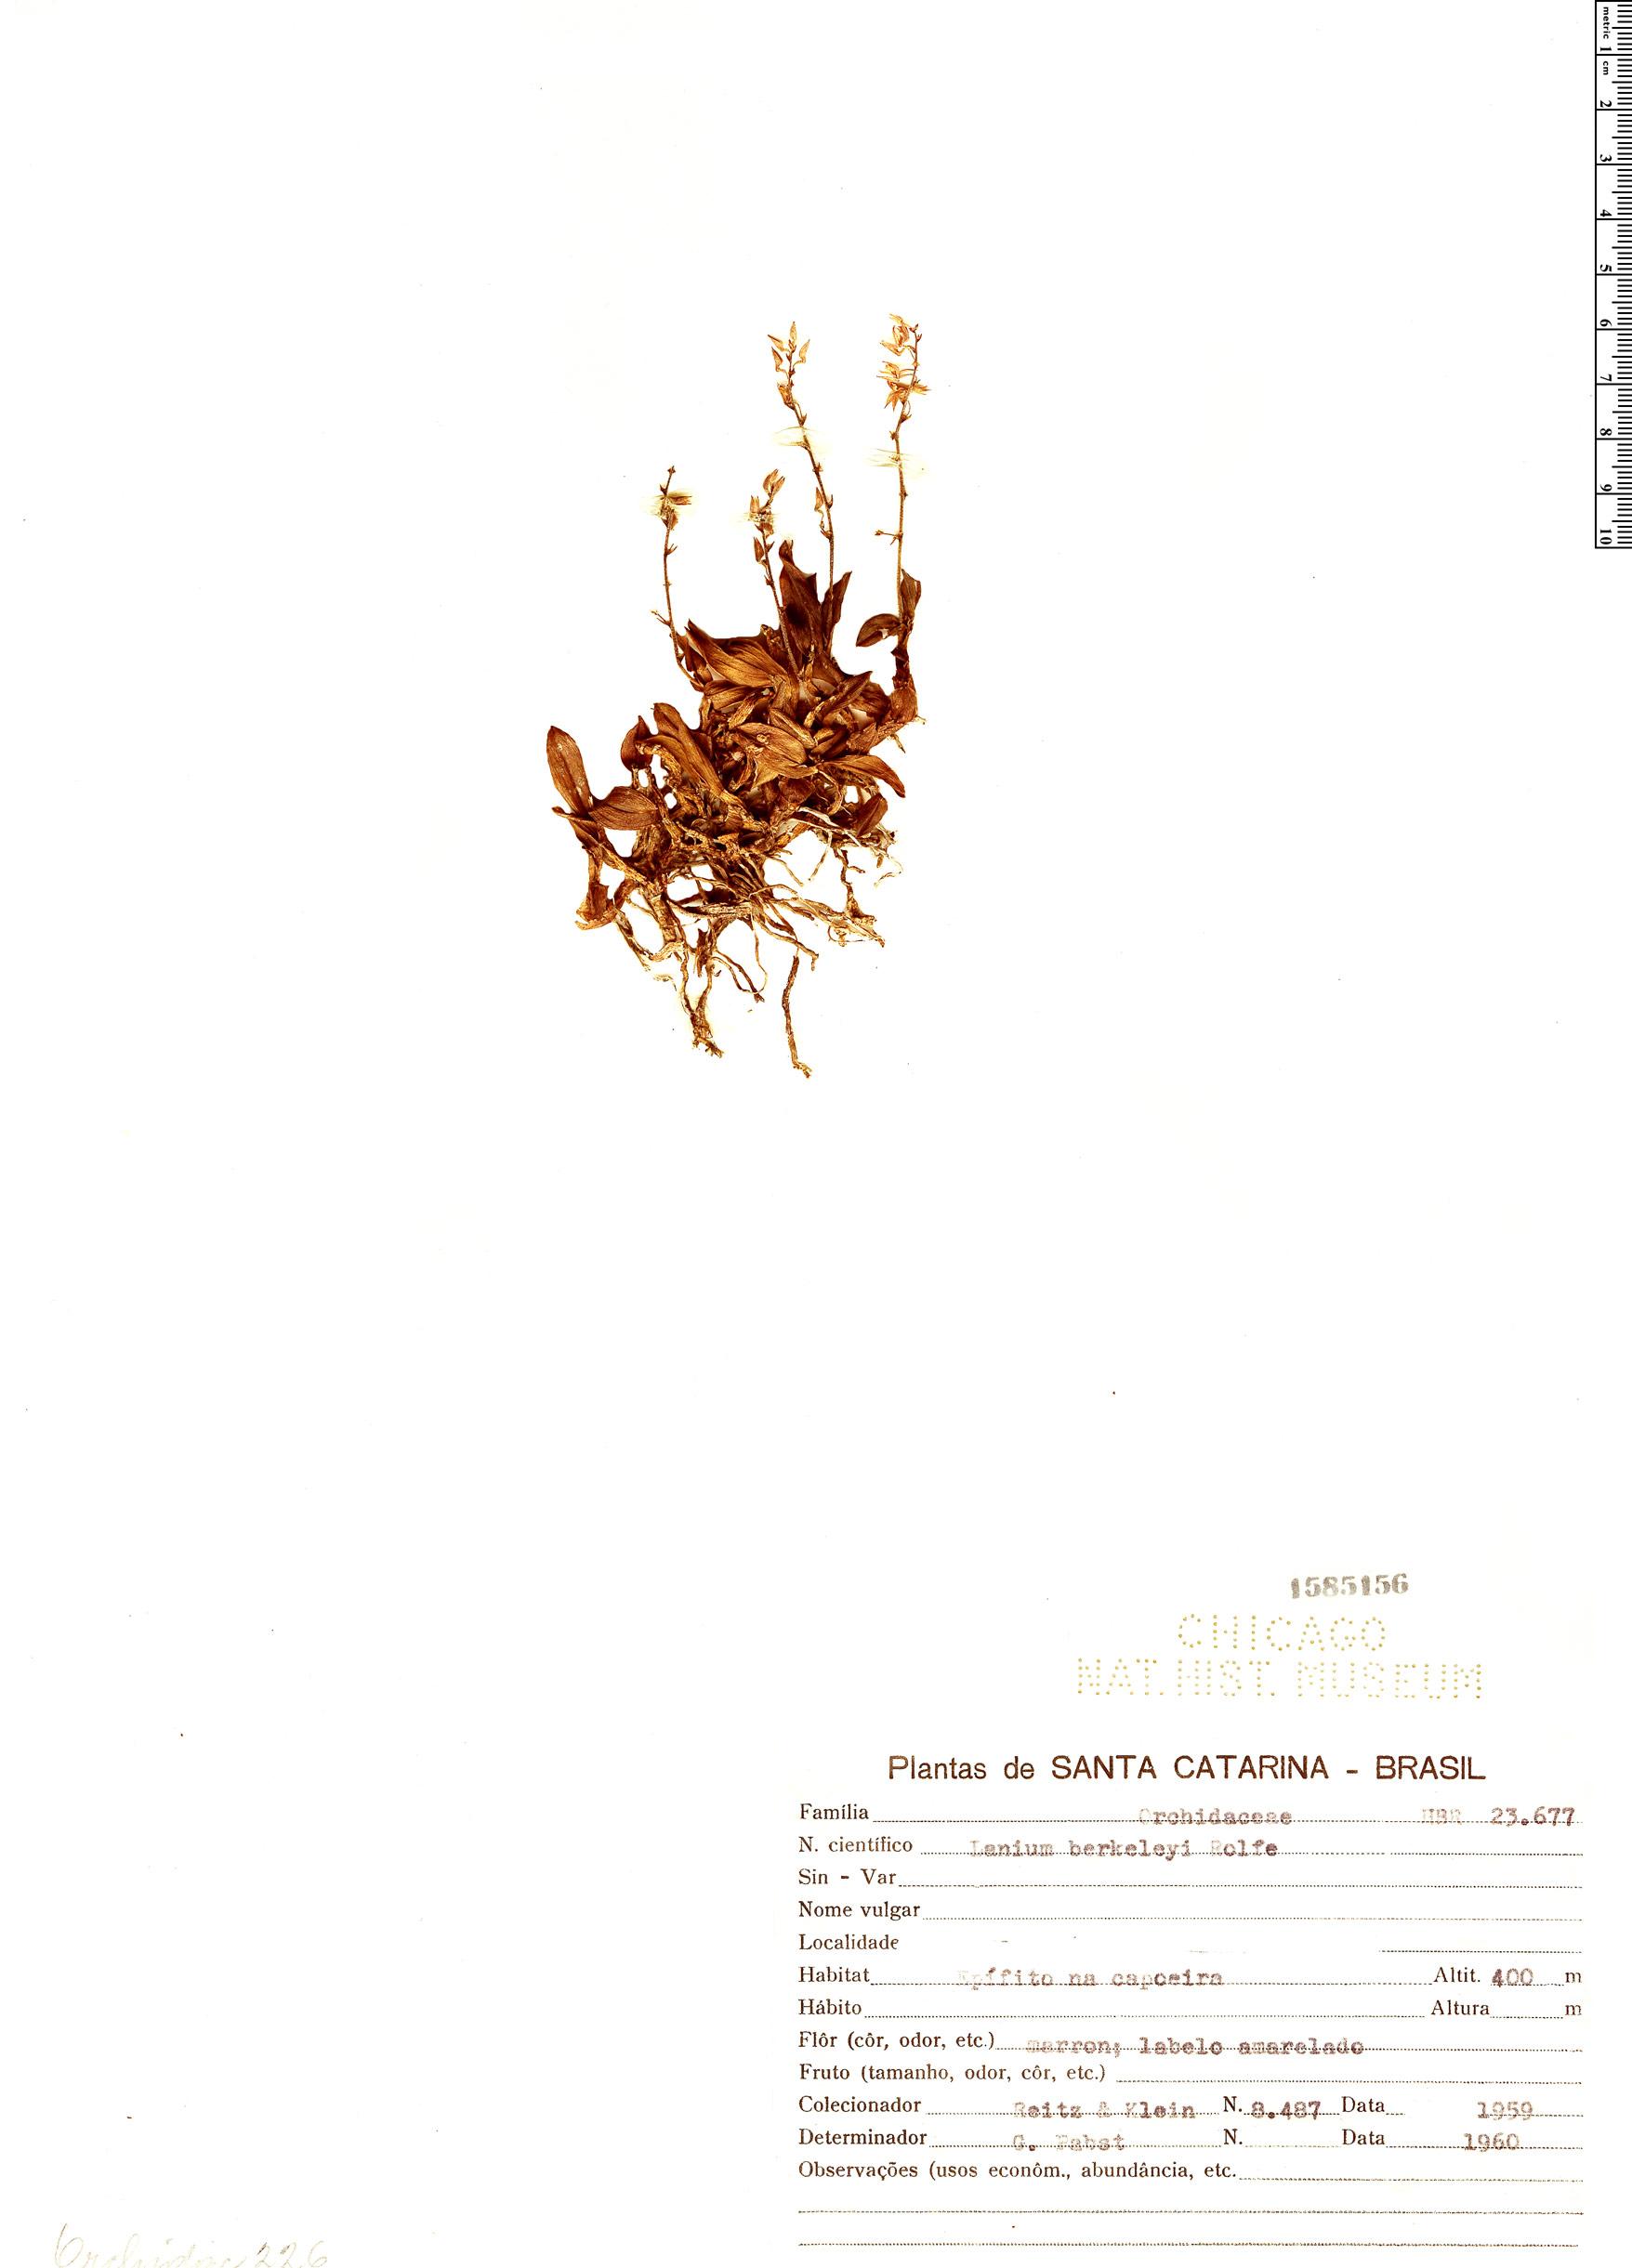 Specimen: Epidendrum berkeleyi